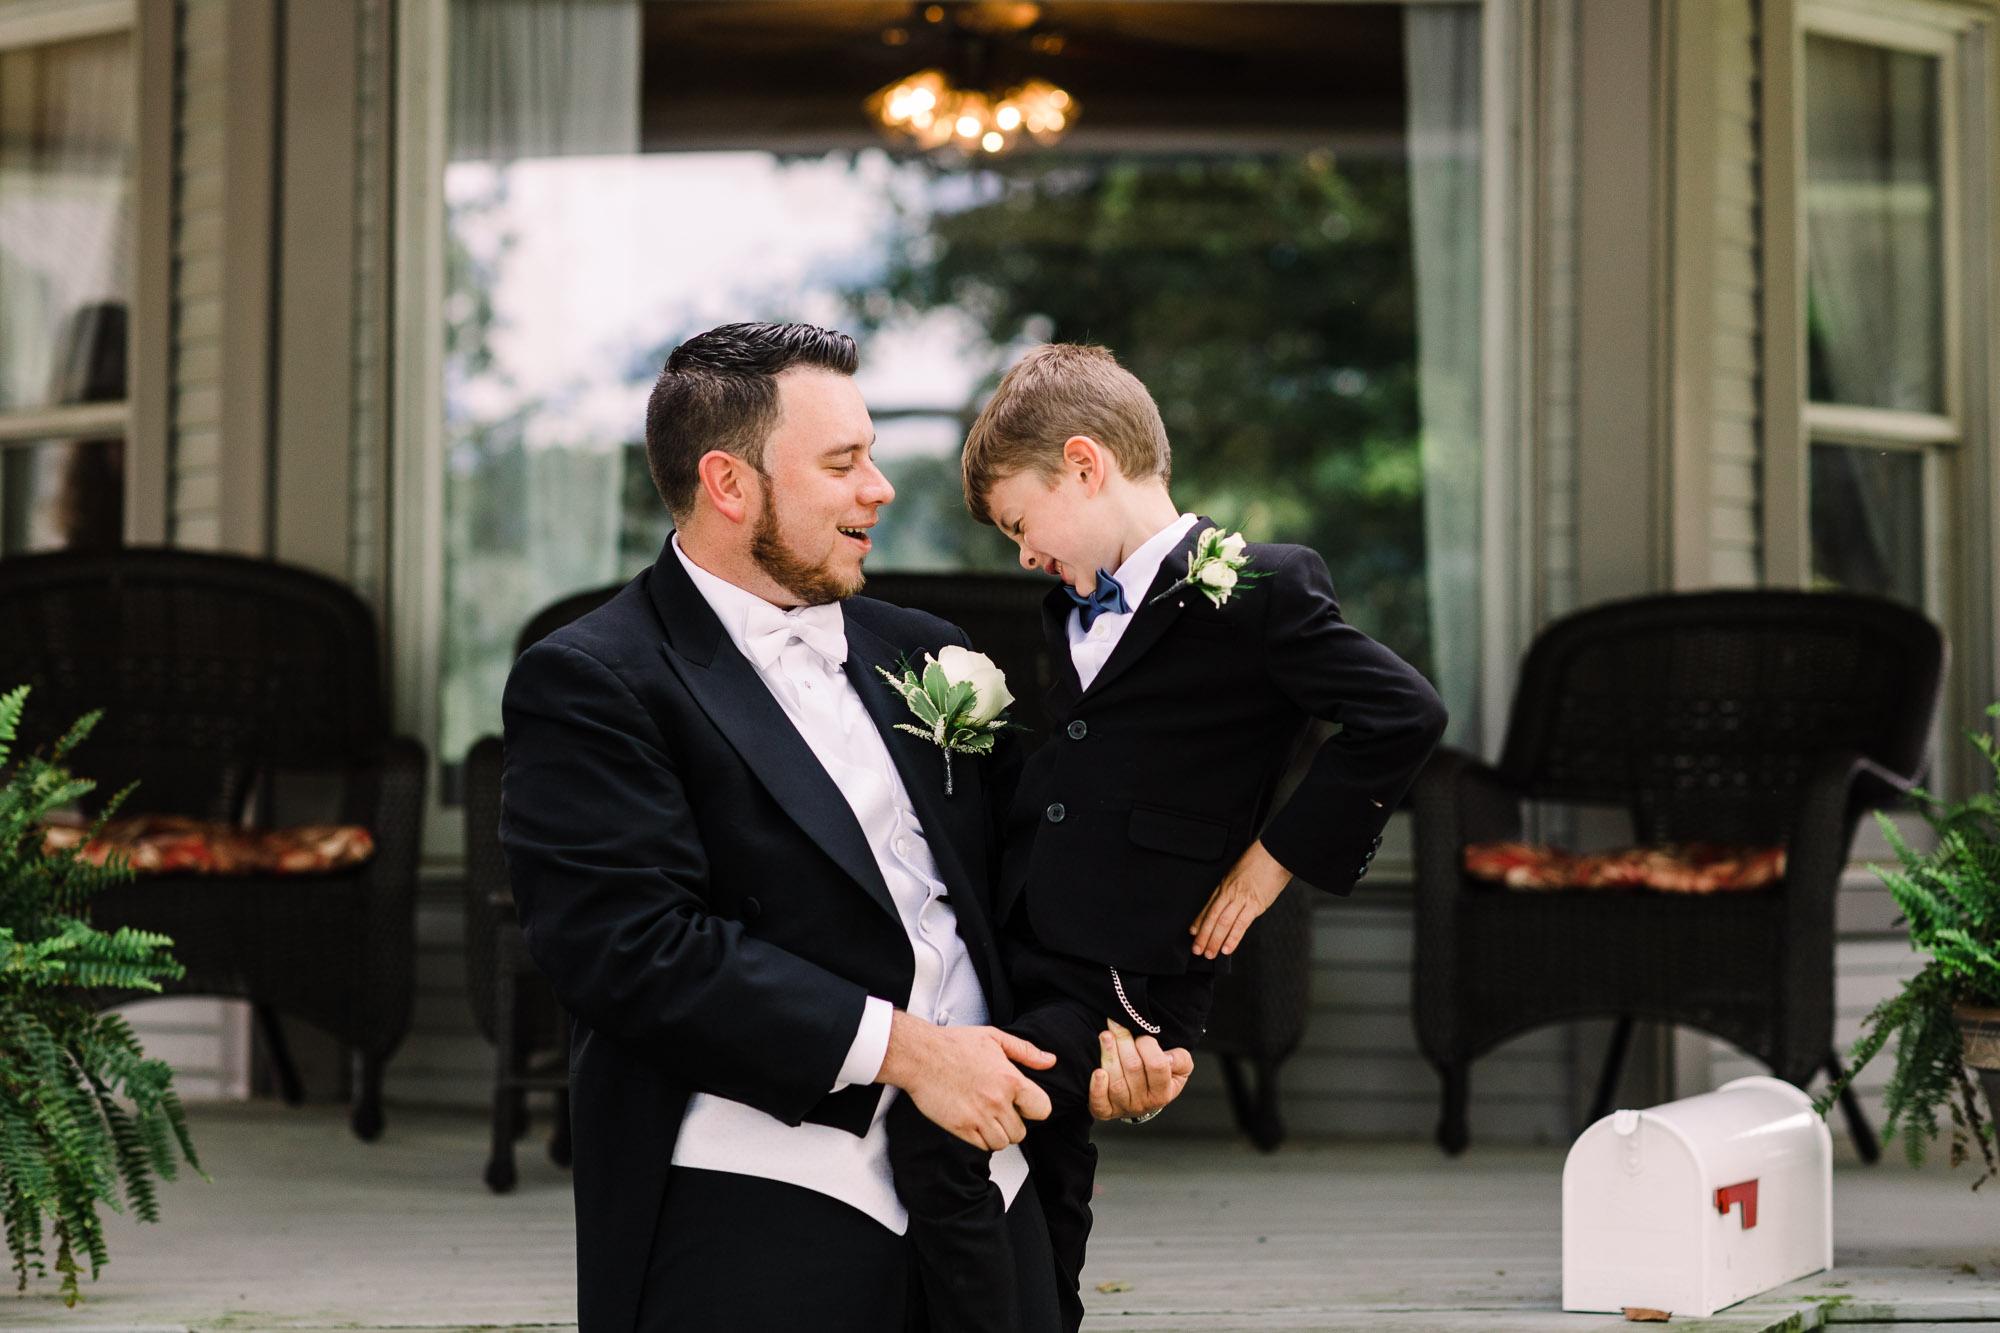 isle-of-que-wedding-6637.jpg